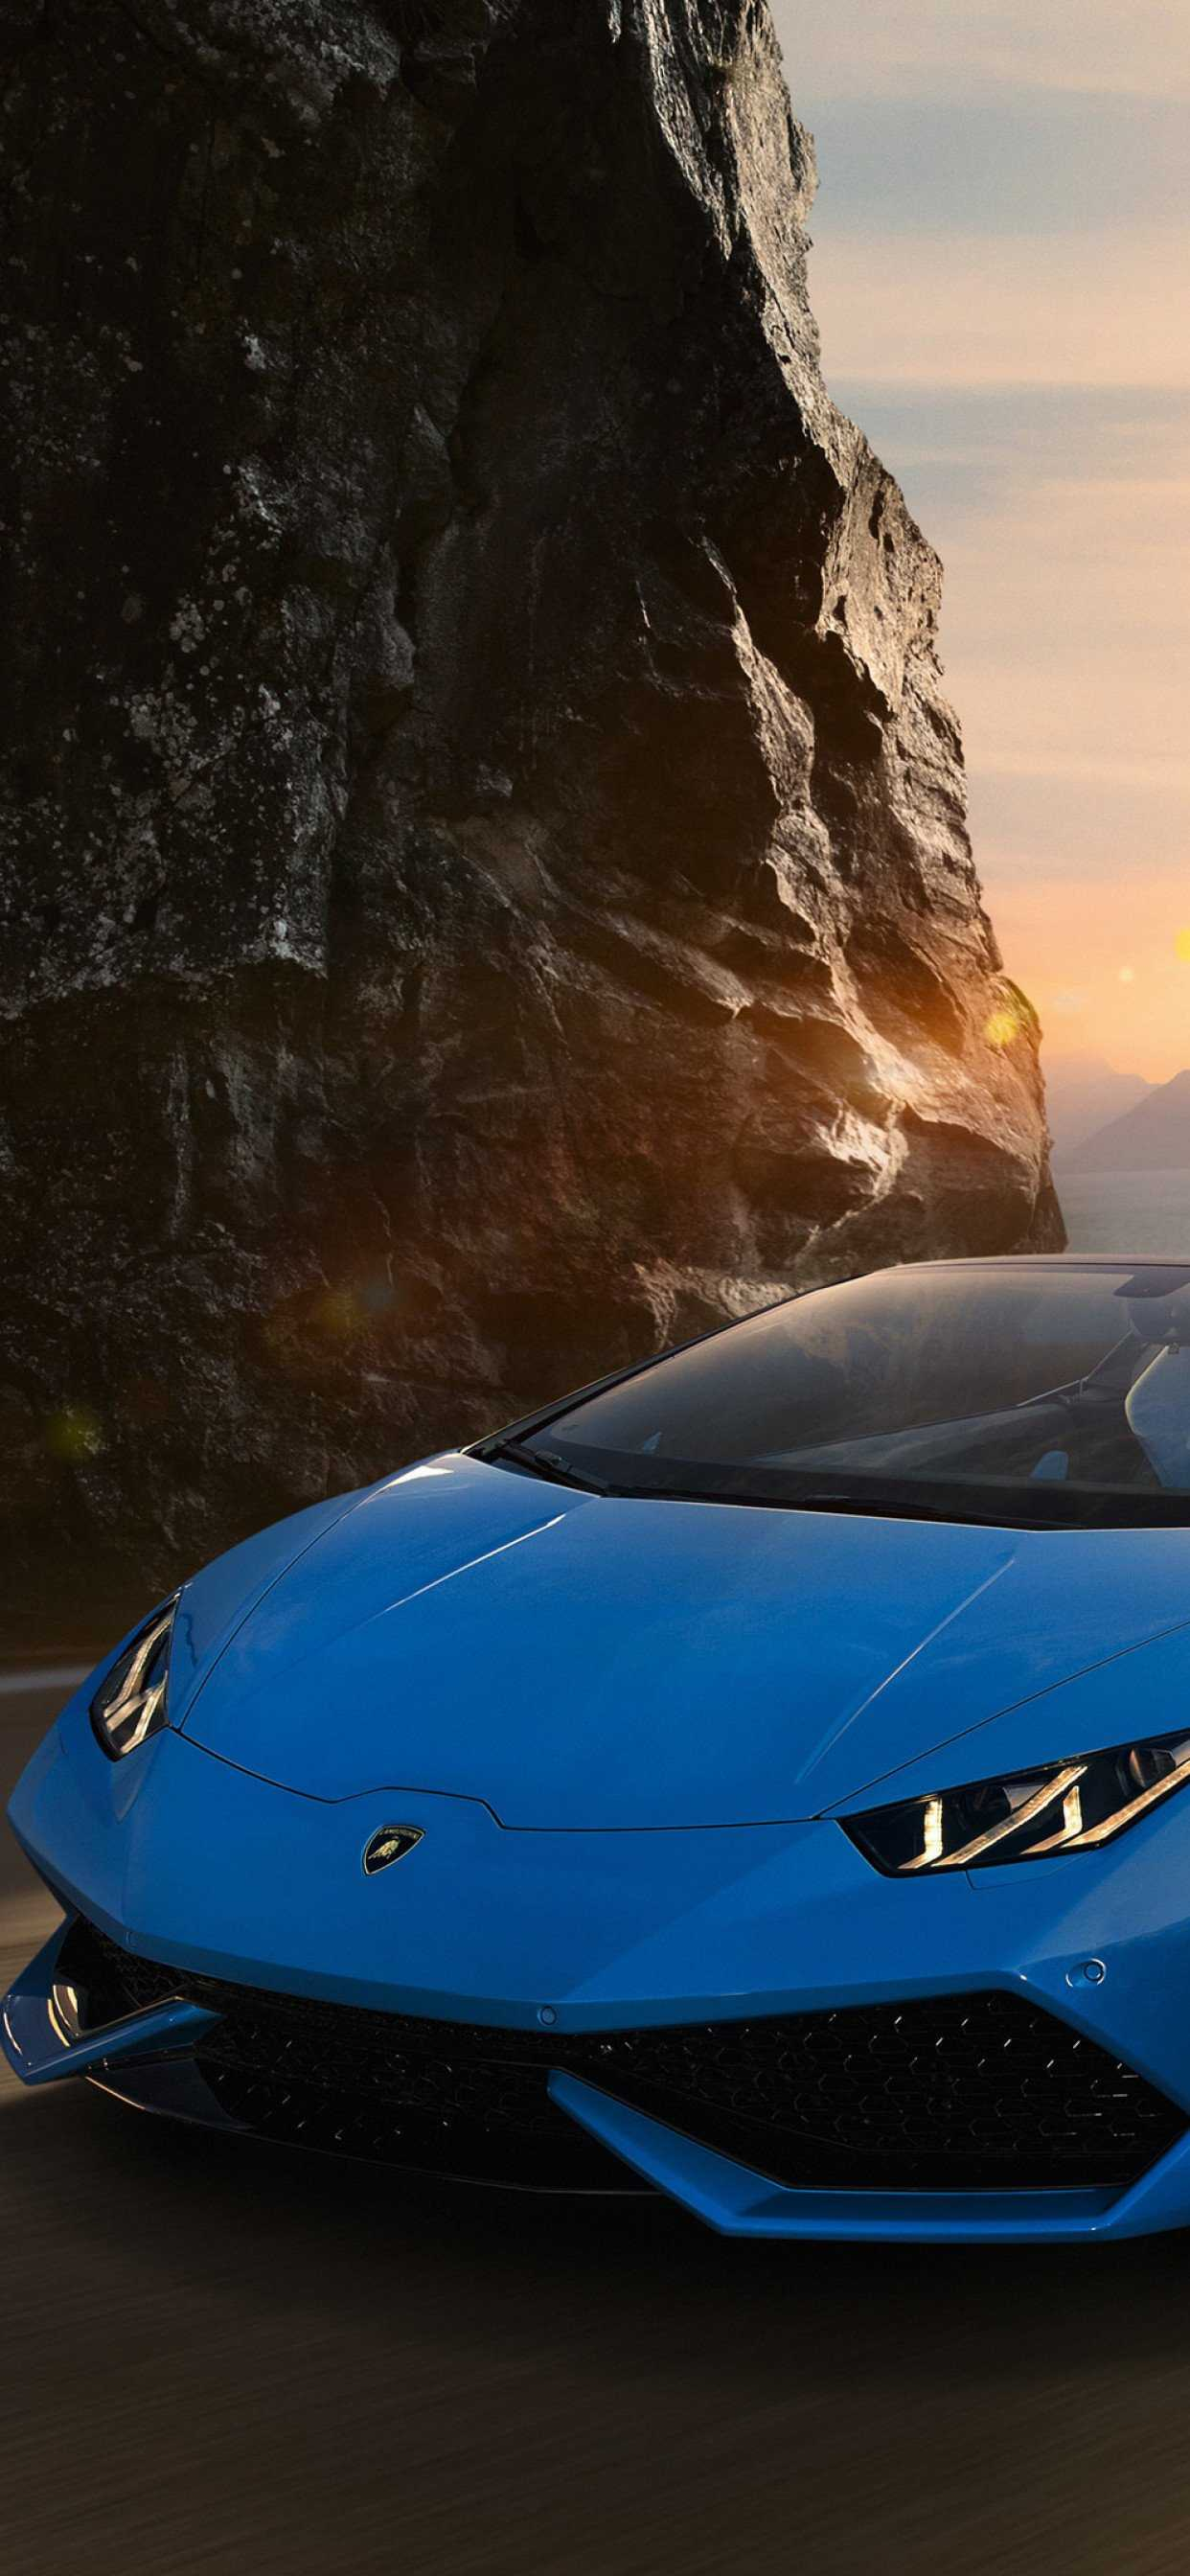 Blue Lamborghini Wallpaper : lamborghini, wallpaper, Lamborghini, Wallpaper, Iphone, (#3152689), Backgrounds, Download